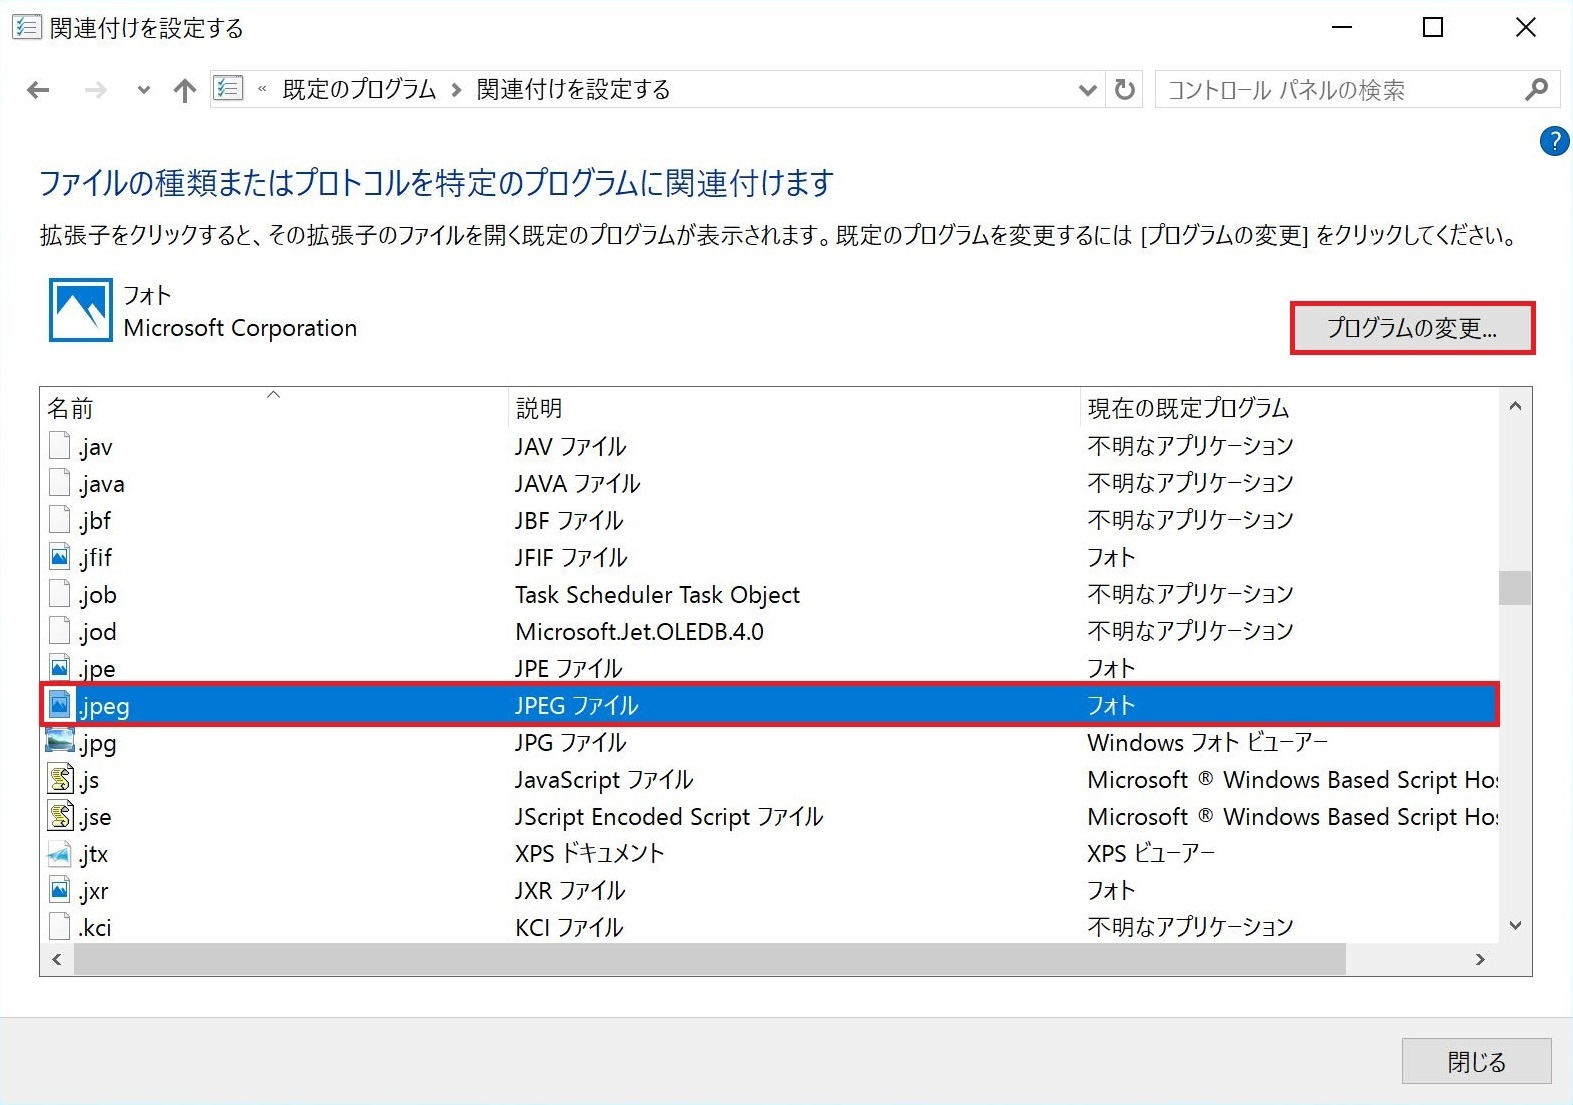 Win10_Viewer_12.JPG